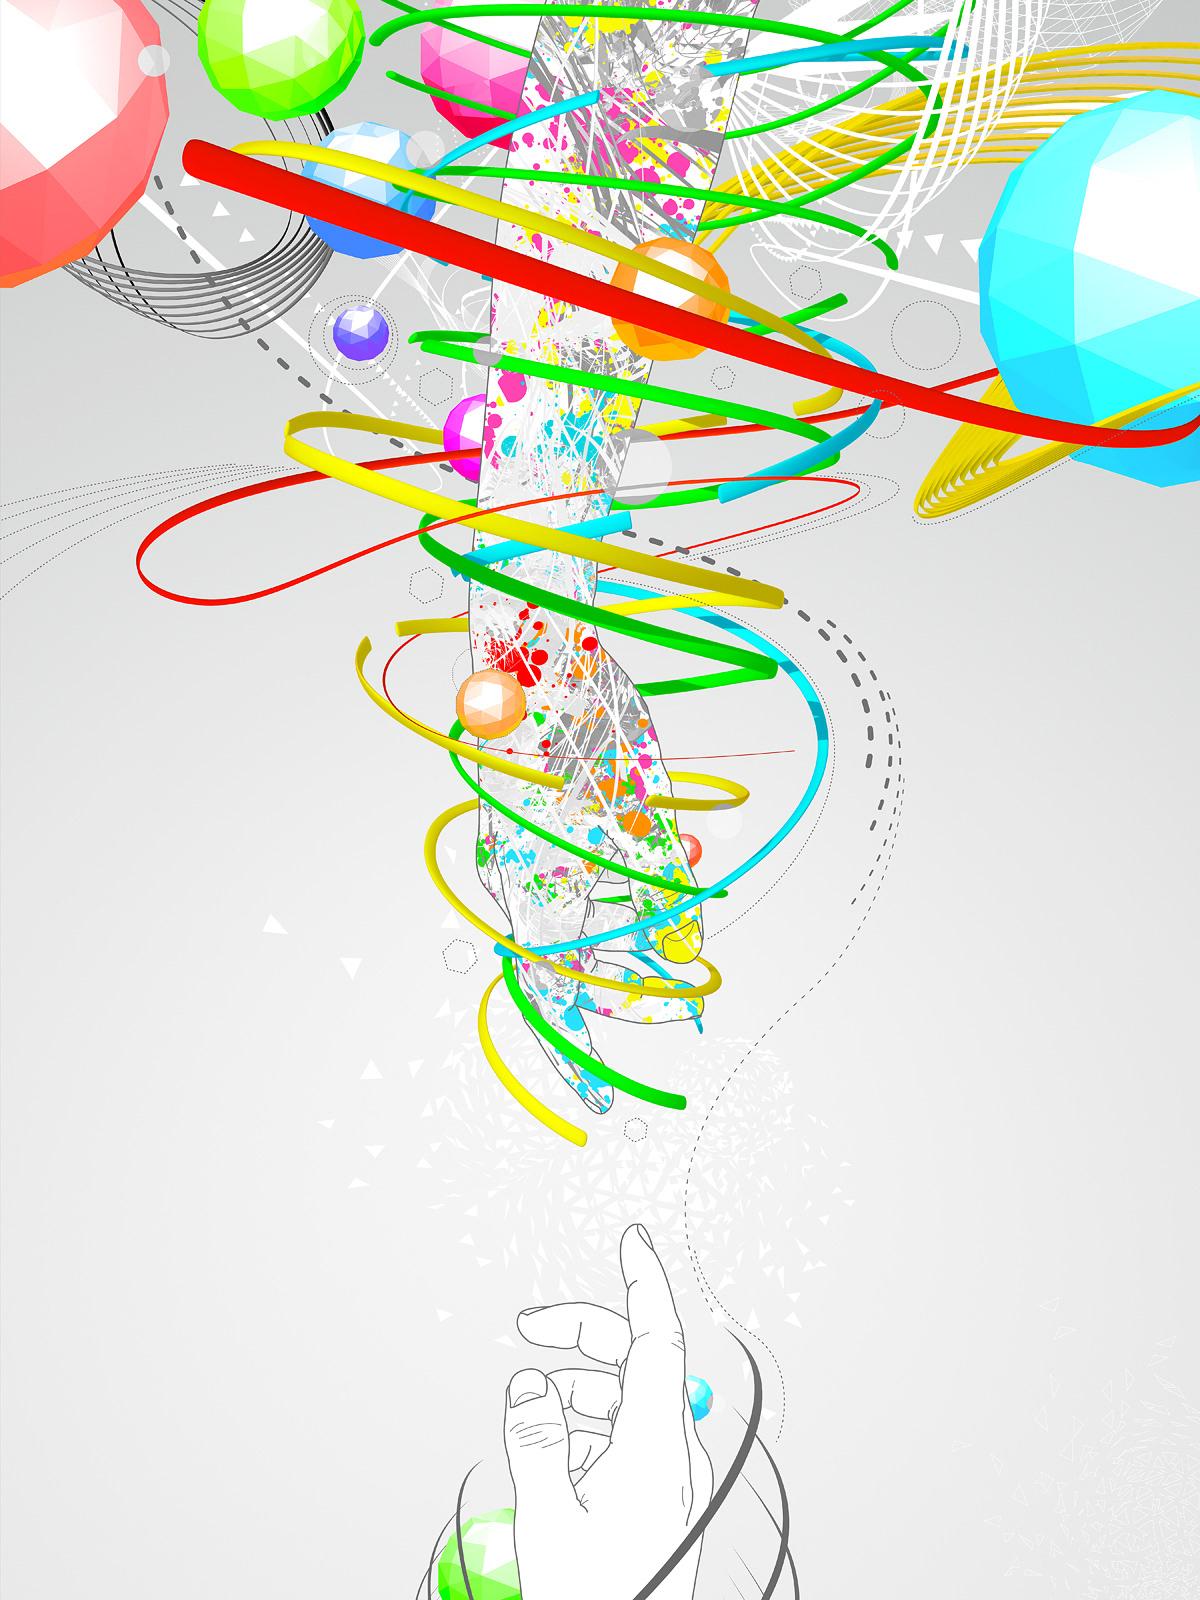 Digital illustration made as a poster for a design studio.